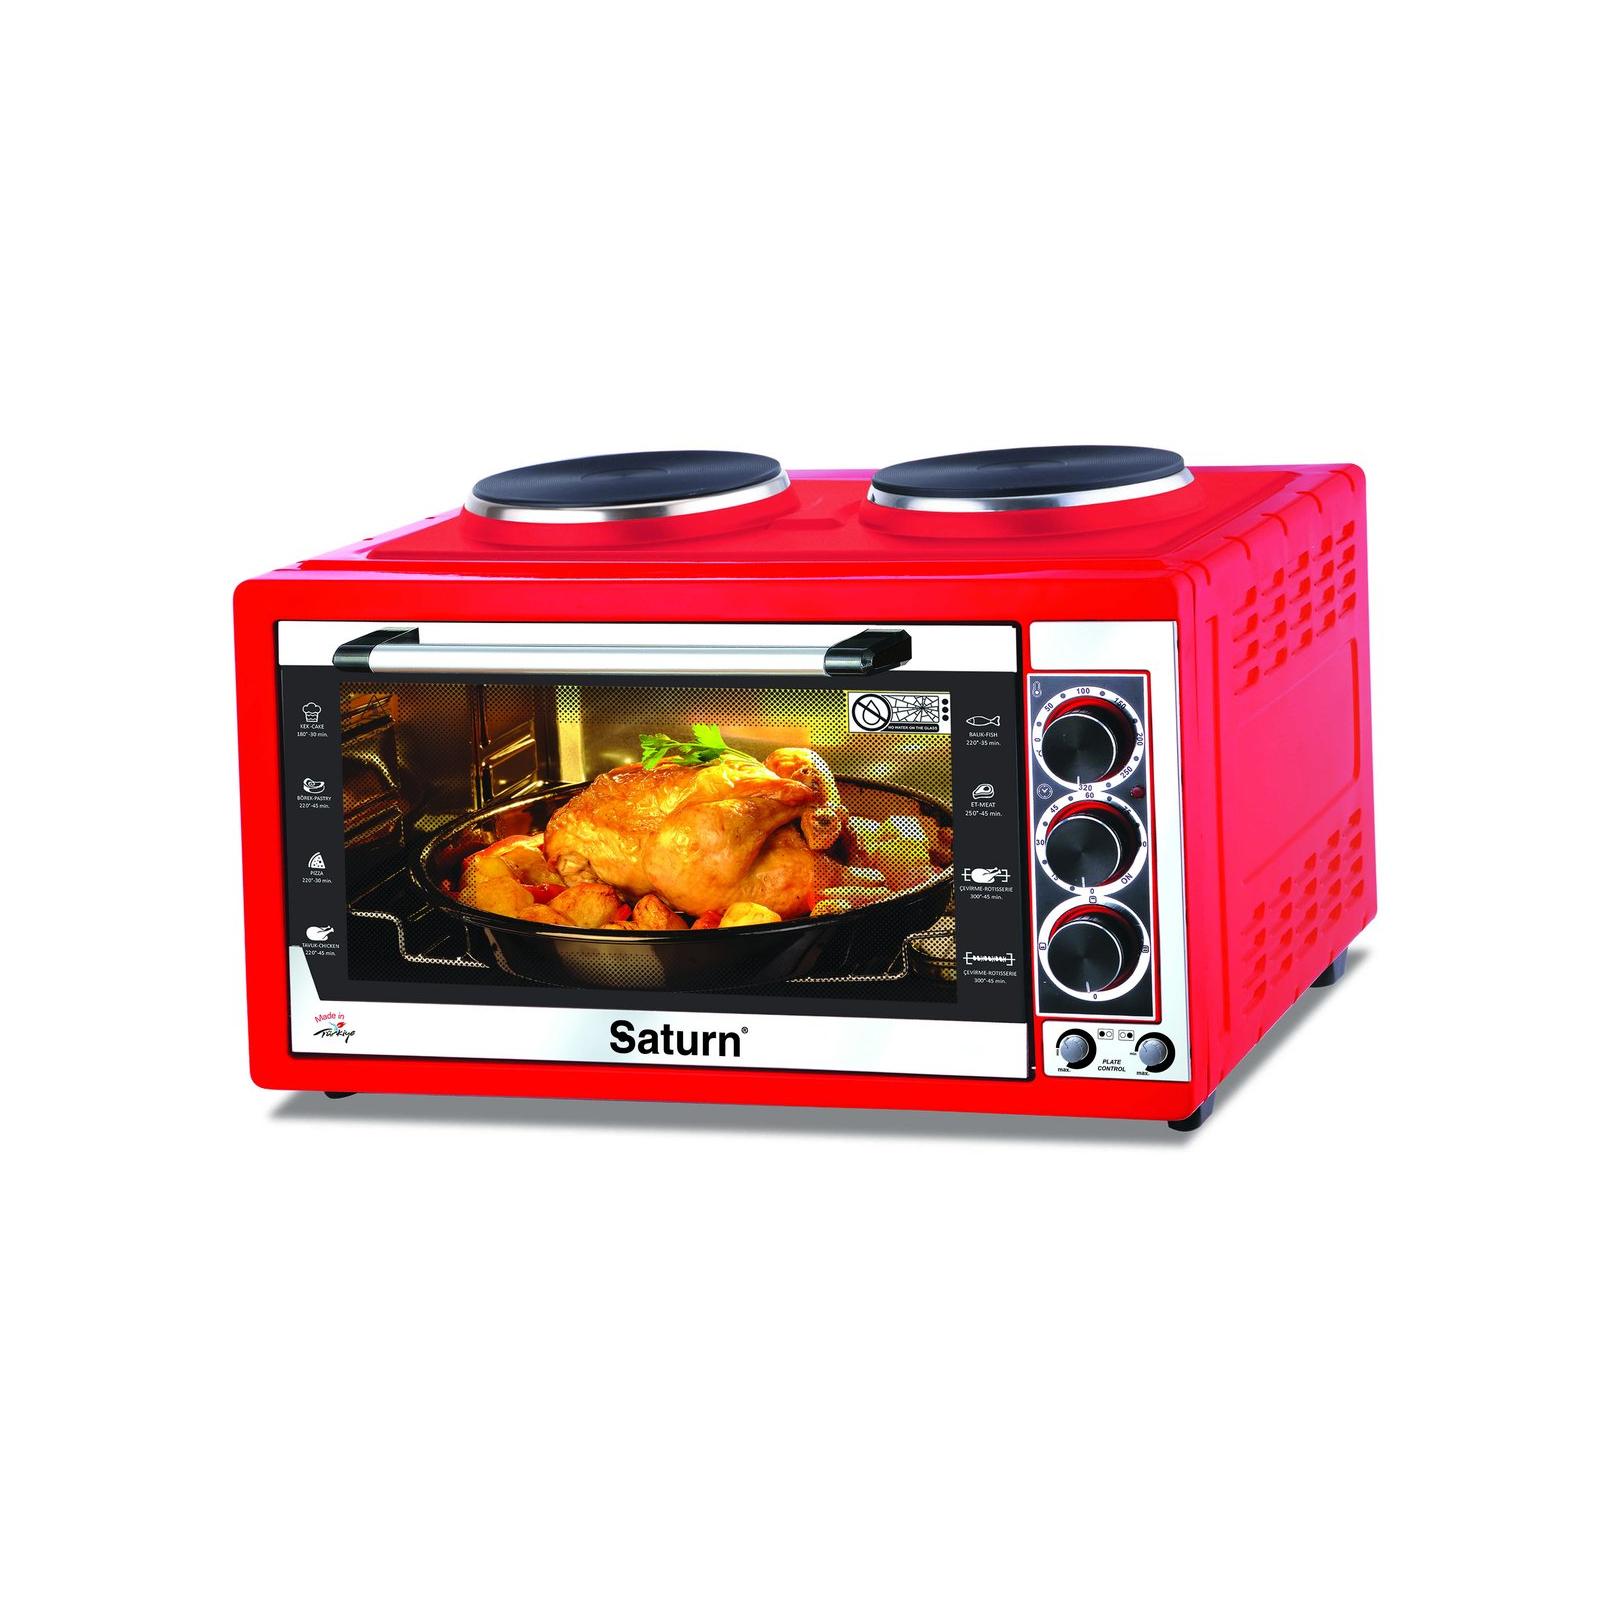 Электропечь SATURN ST-EC 10711 Red (ST-EC10711 Red)